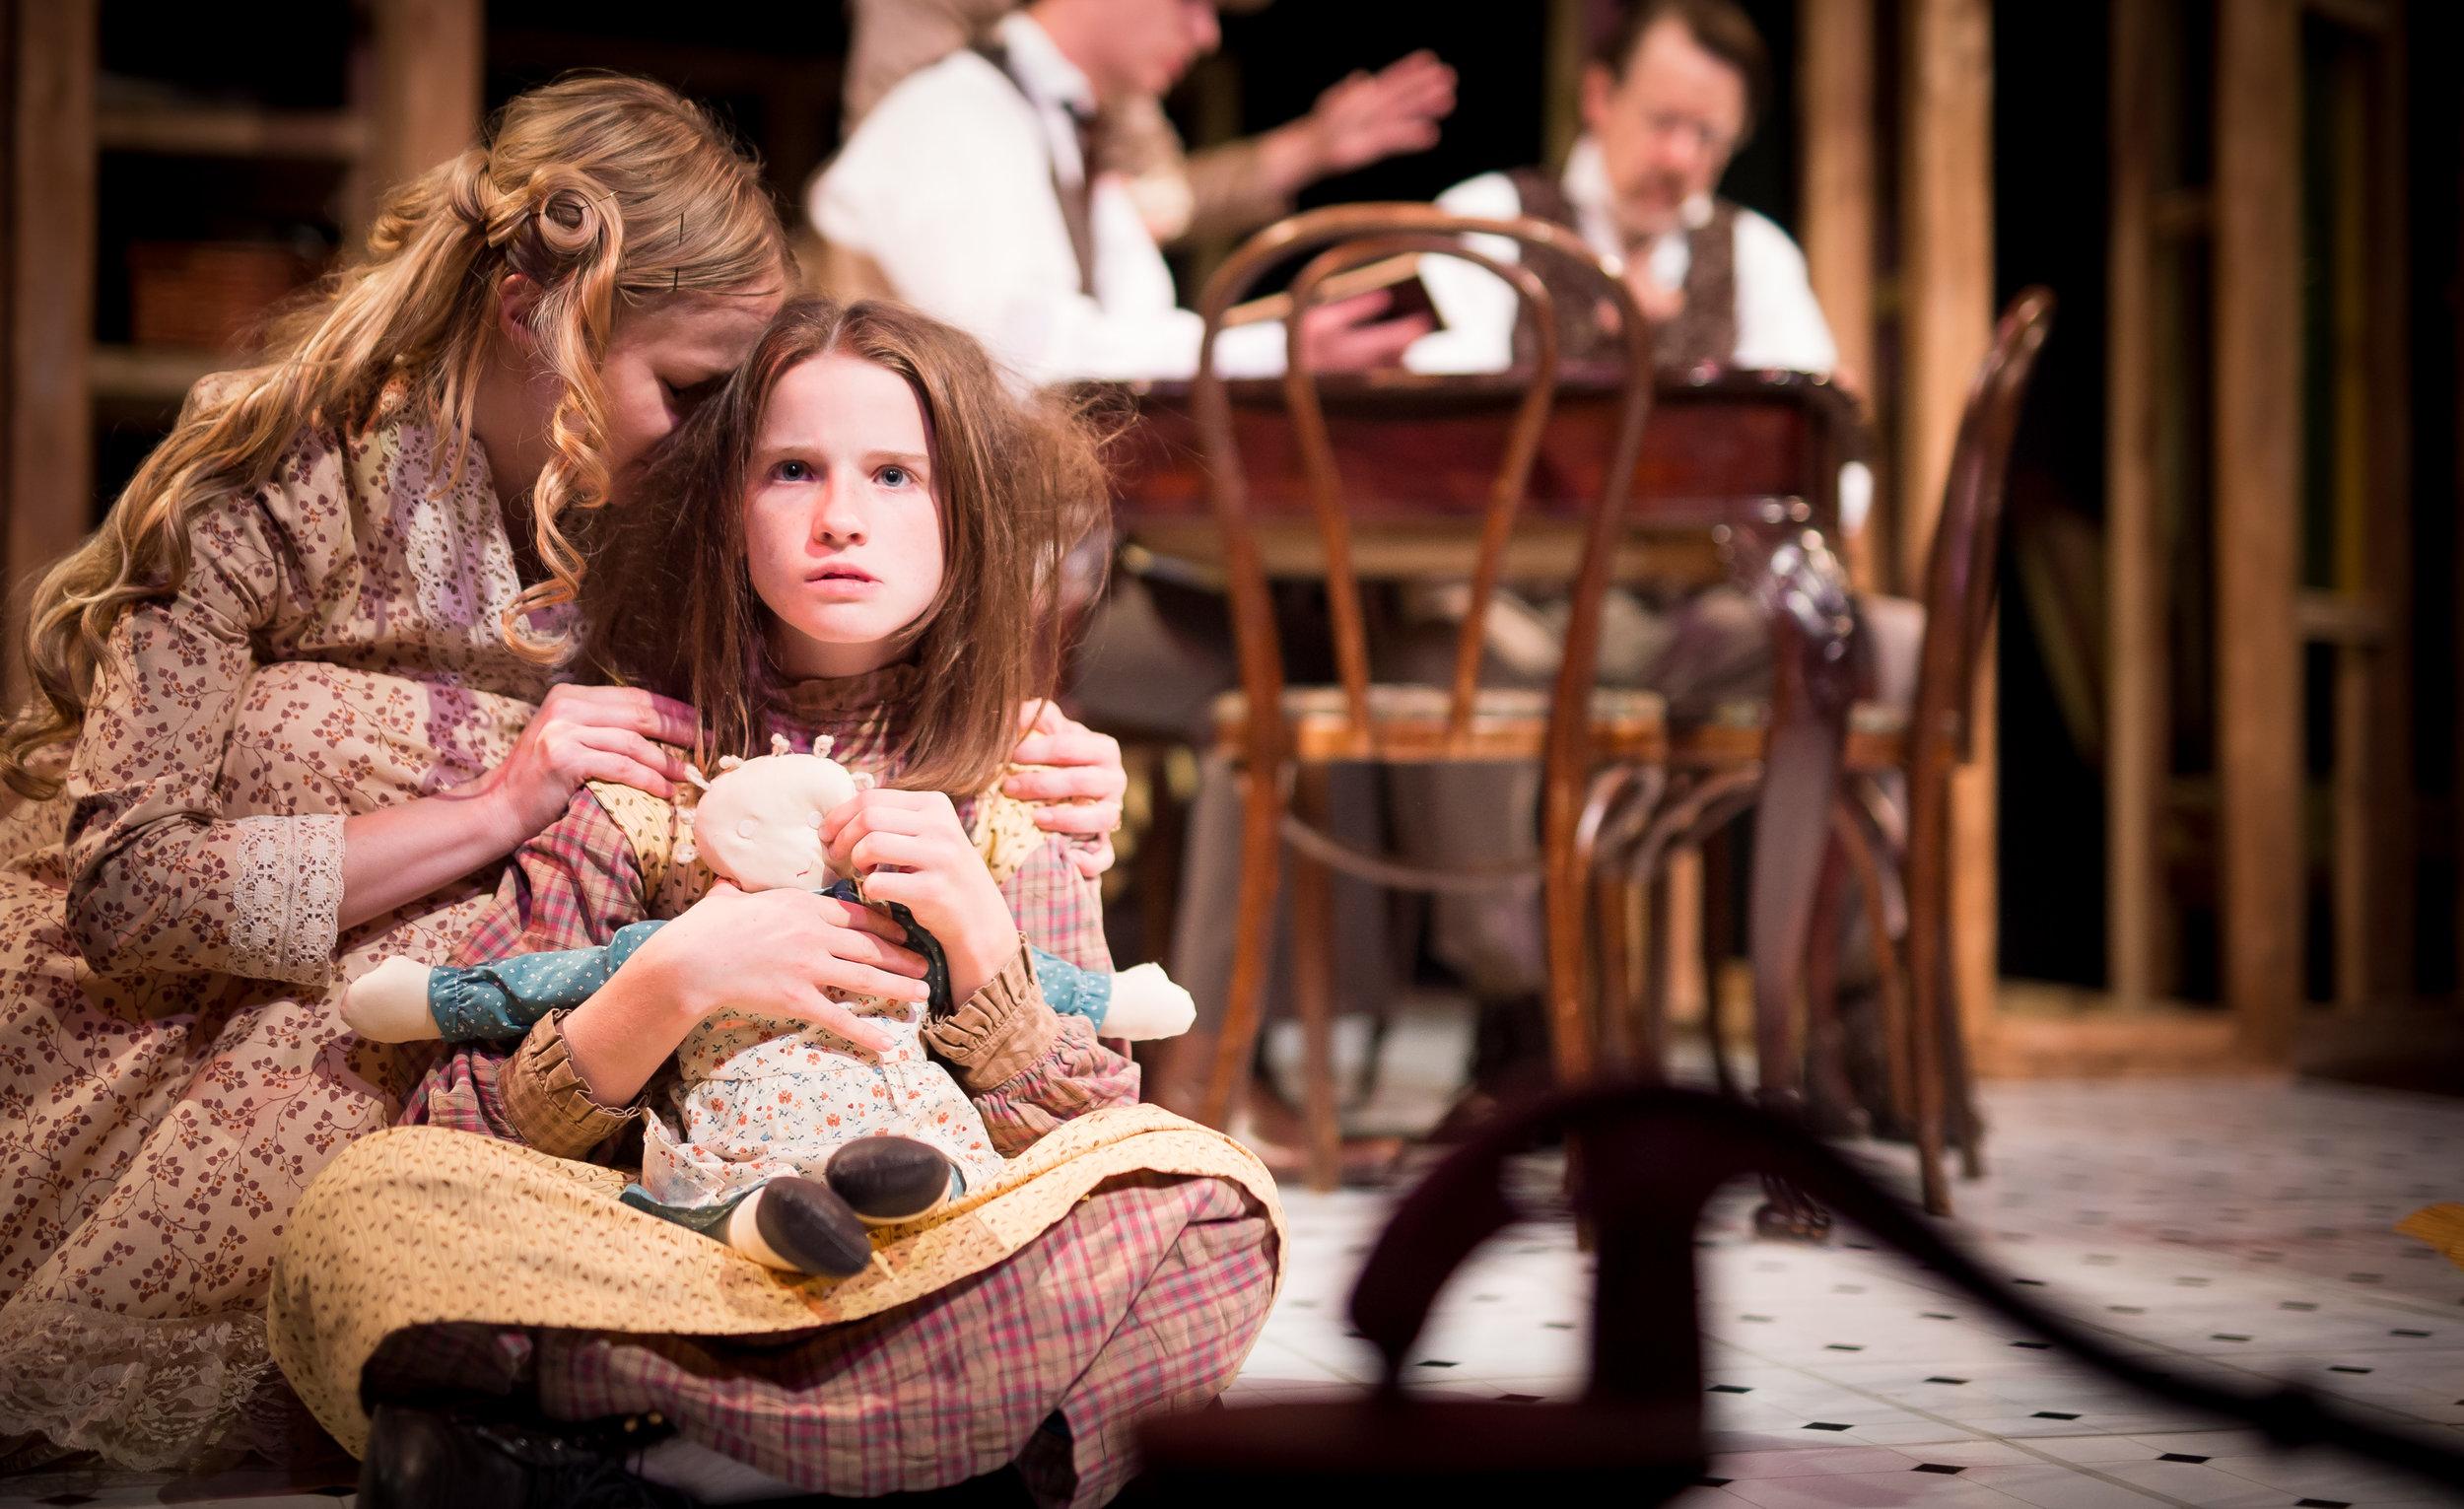 045-Yellow Tree Theatre-Miracle Worker-Helen Keller-Osseo-Minneapolis-community-photography-September 11, 2018-www.jcoxphotography.com.jpg